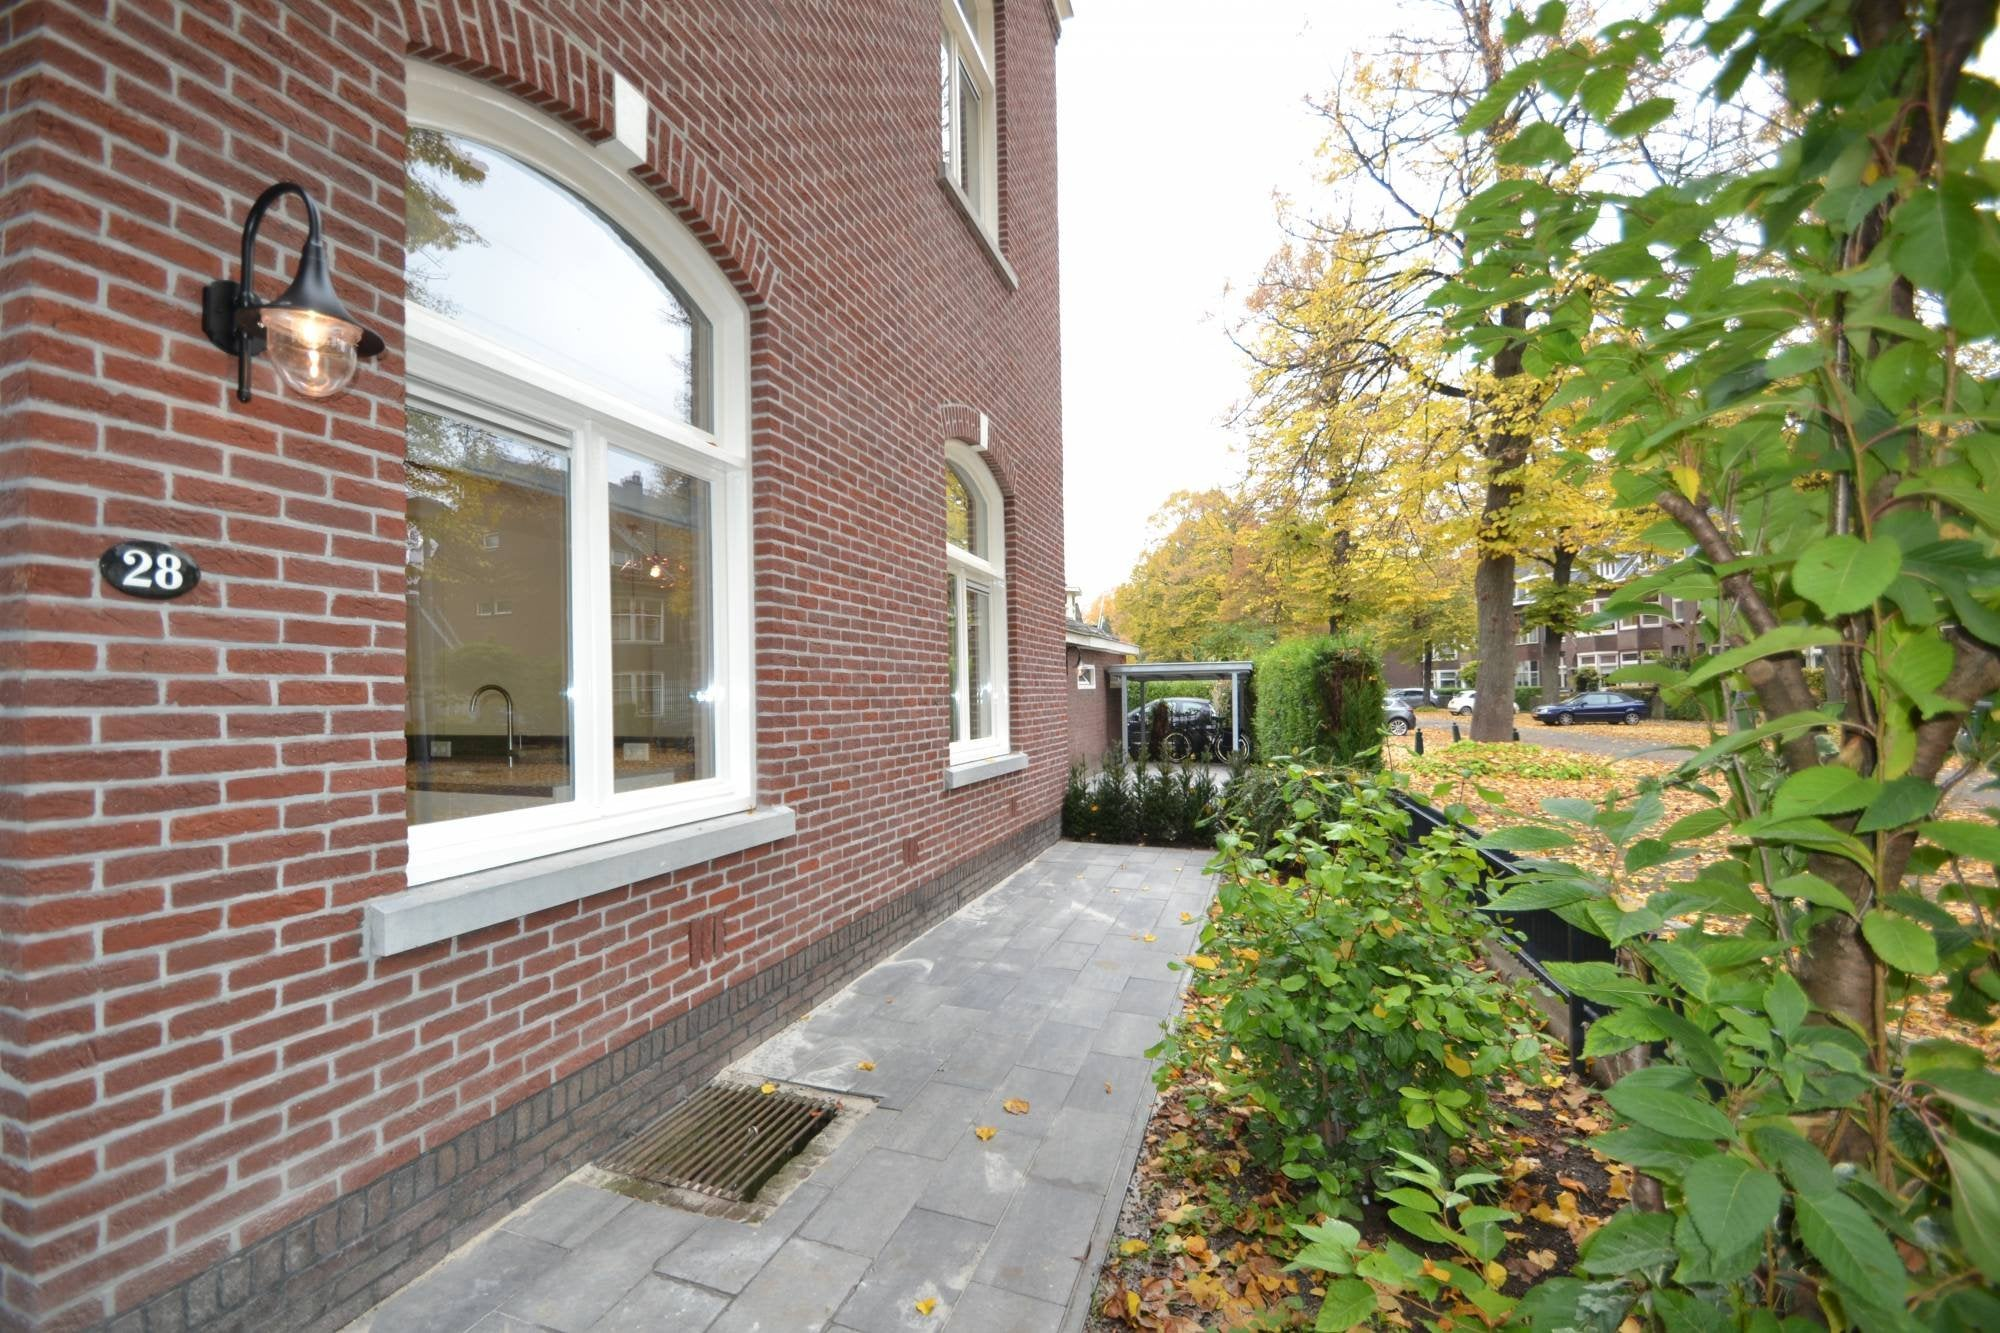 Maastricht - St. Pieter - Graaf van Waldeckstraat